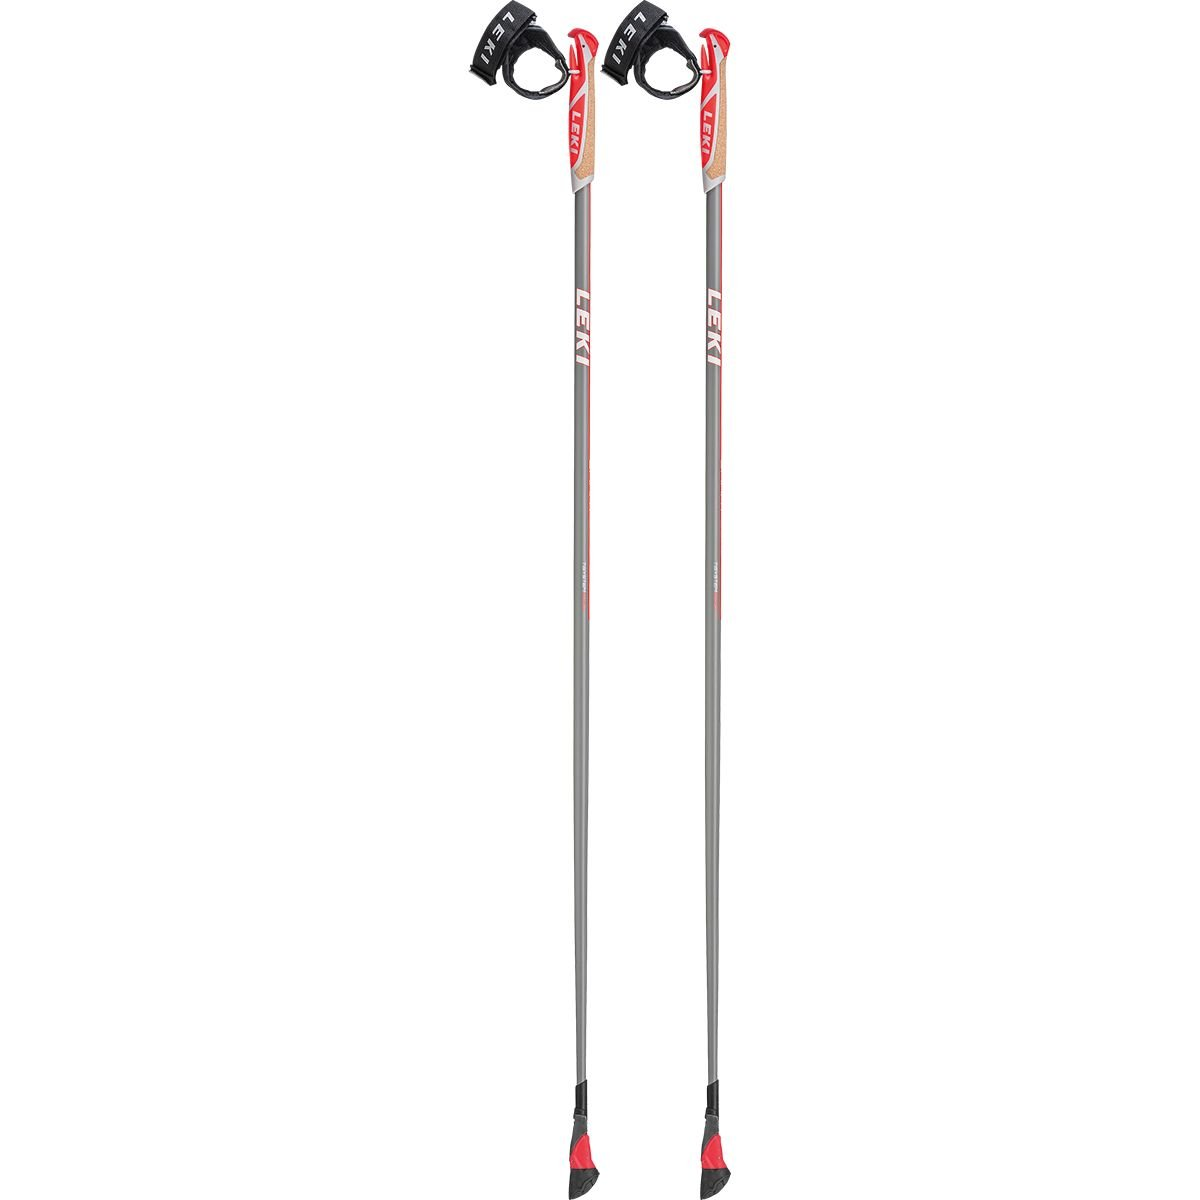 LEKI smart Carat Nordic walkingstöcke trekkingstock teleskopstock neu